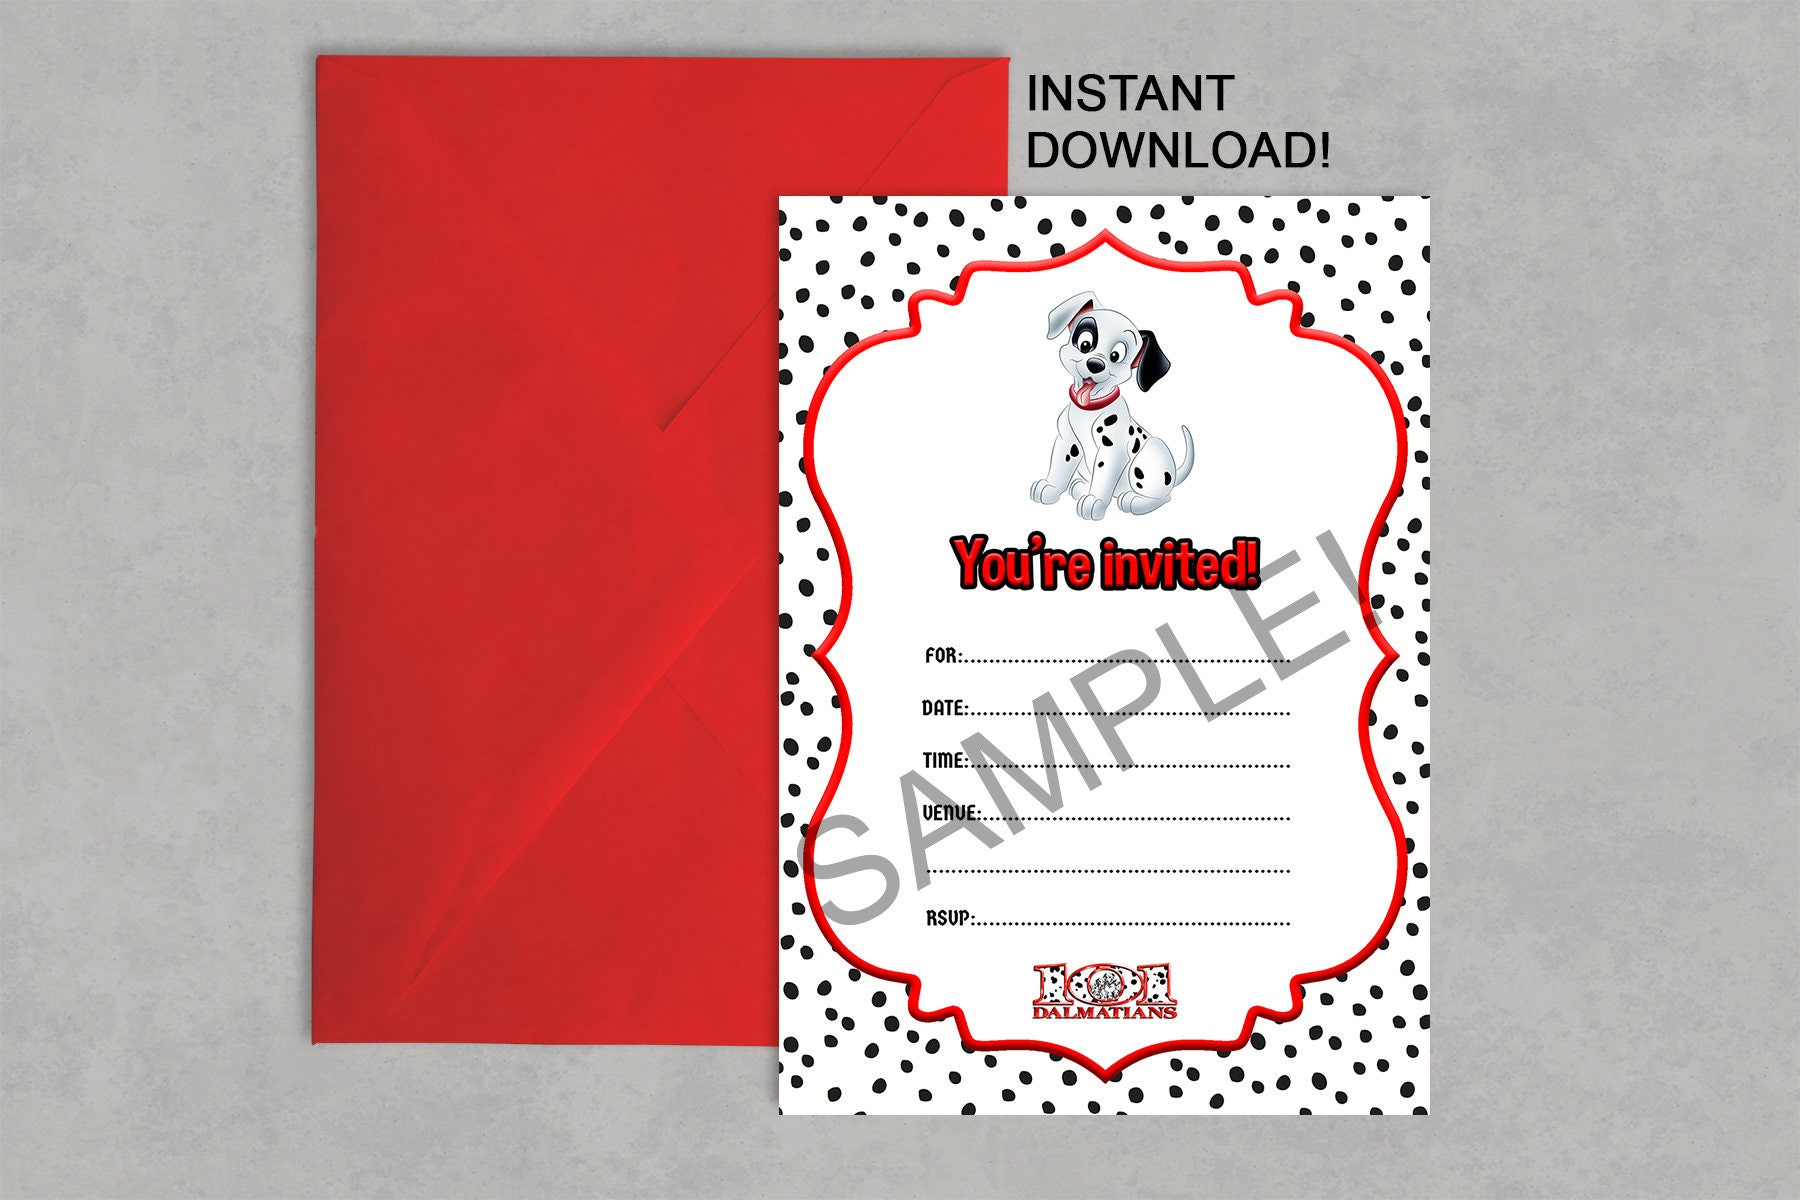 101 Dalmatians Inspired Printable Birthday Invitation DIY | Etsy